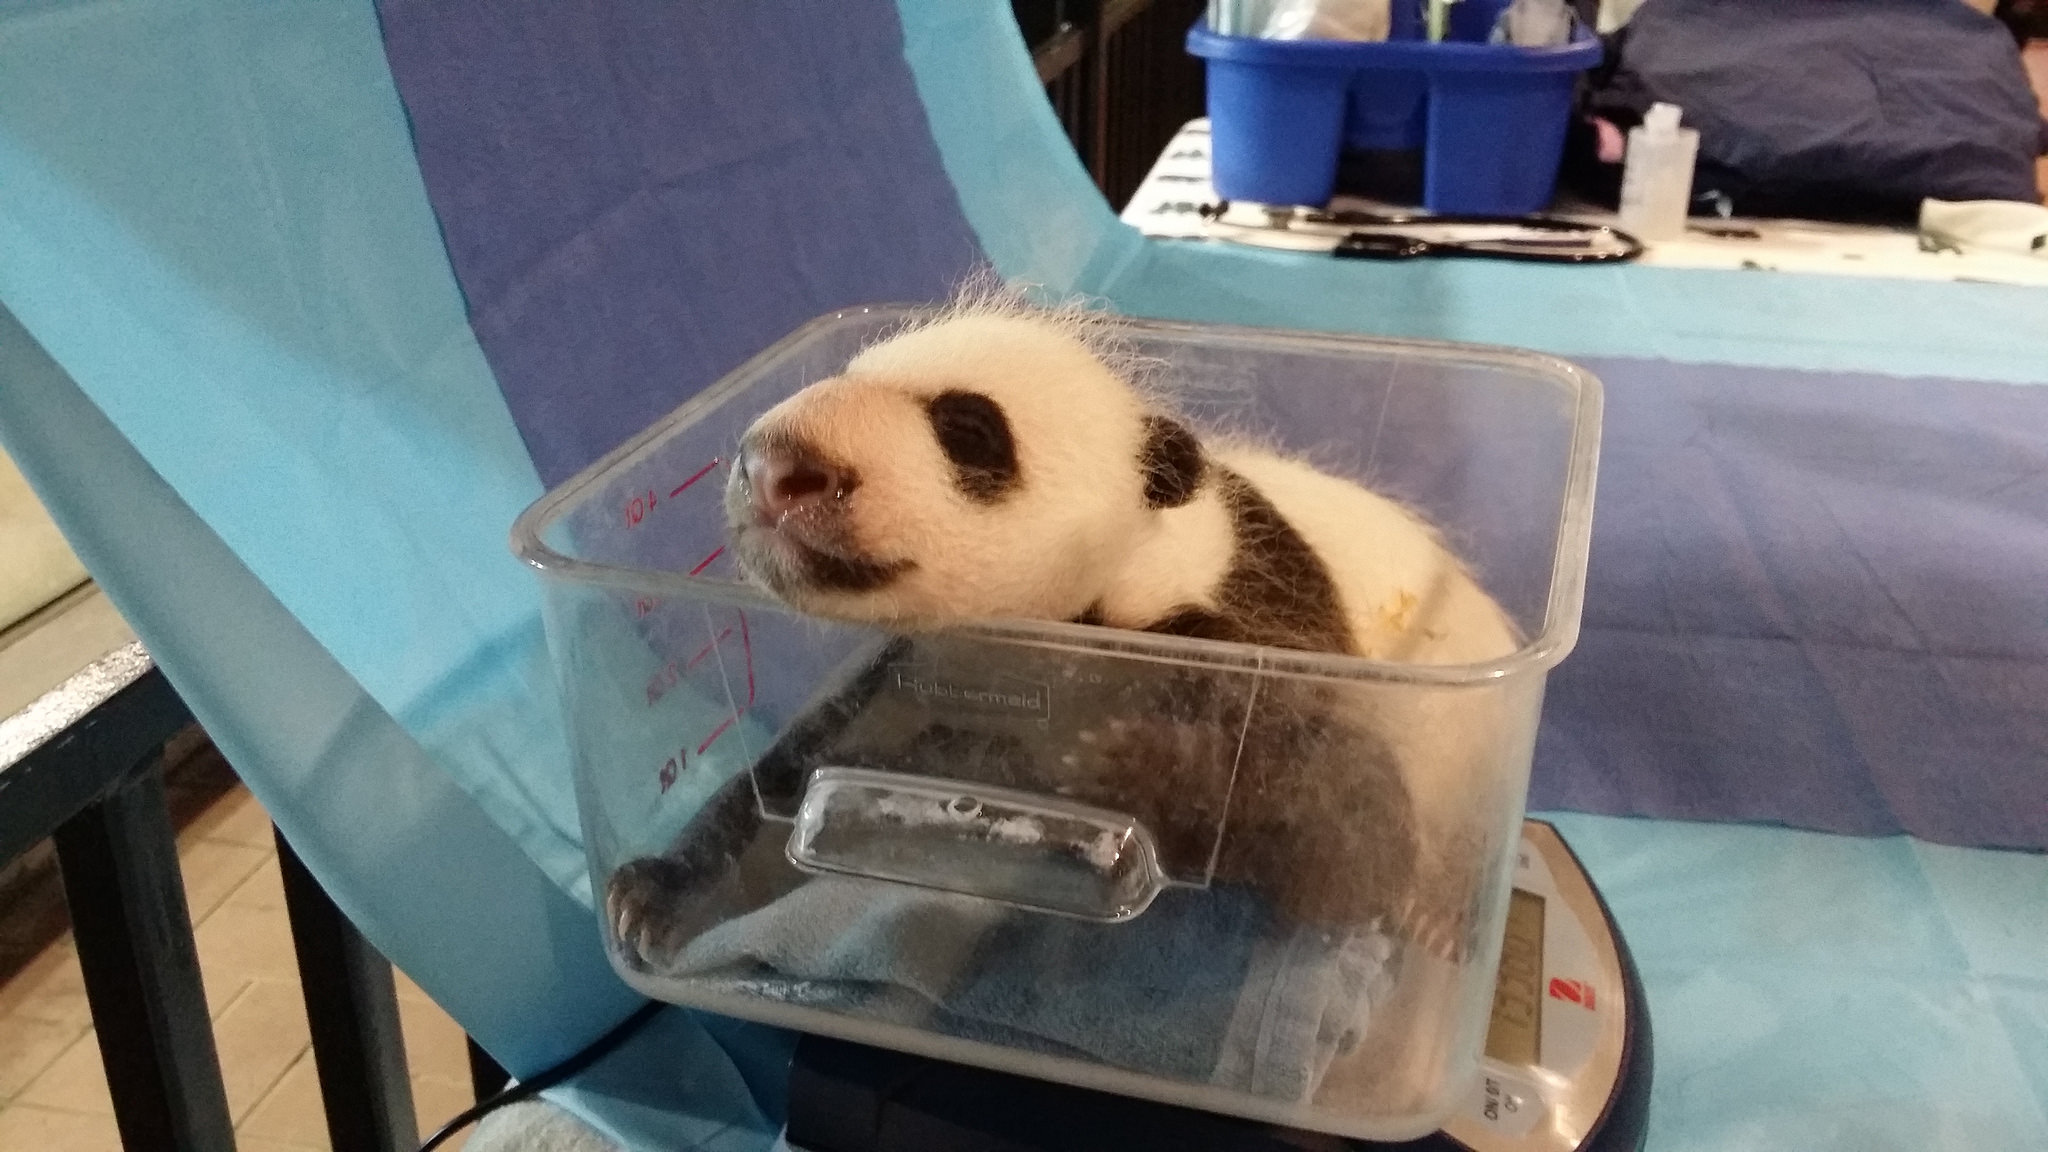 Baby panda gets name early